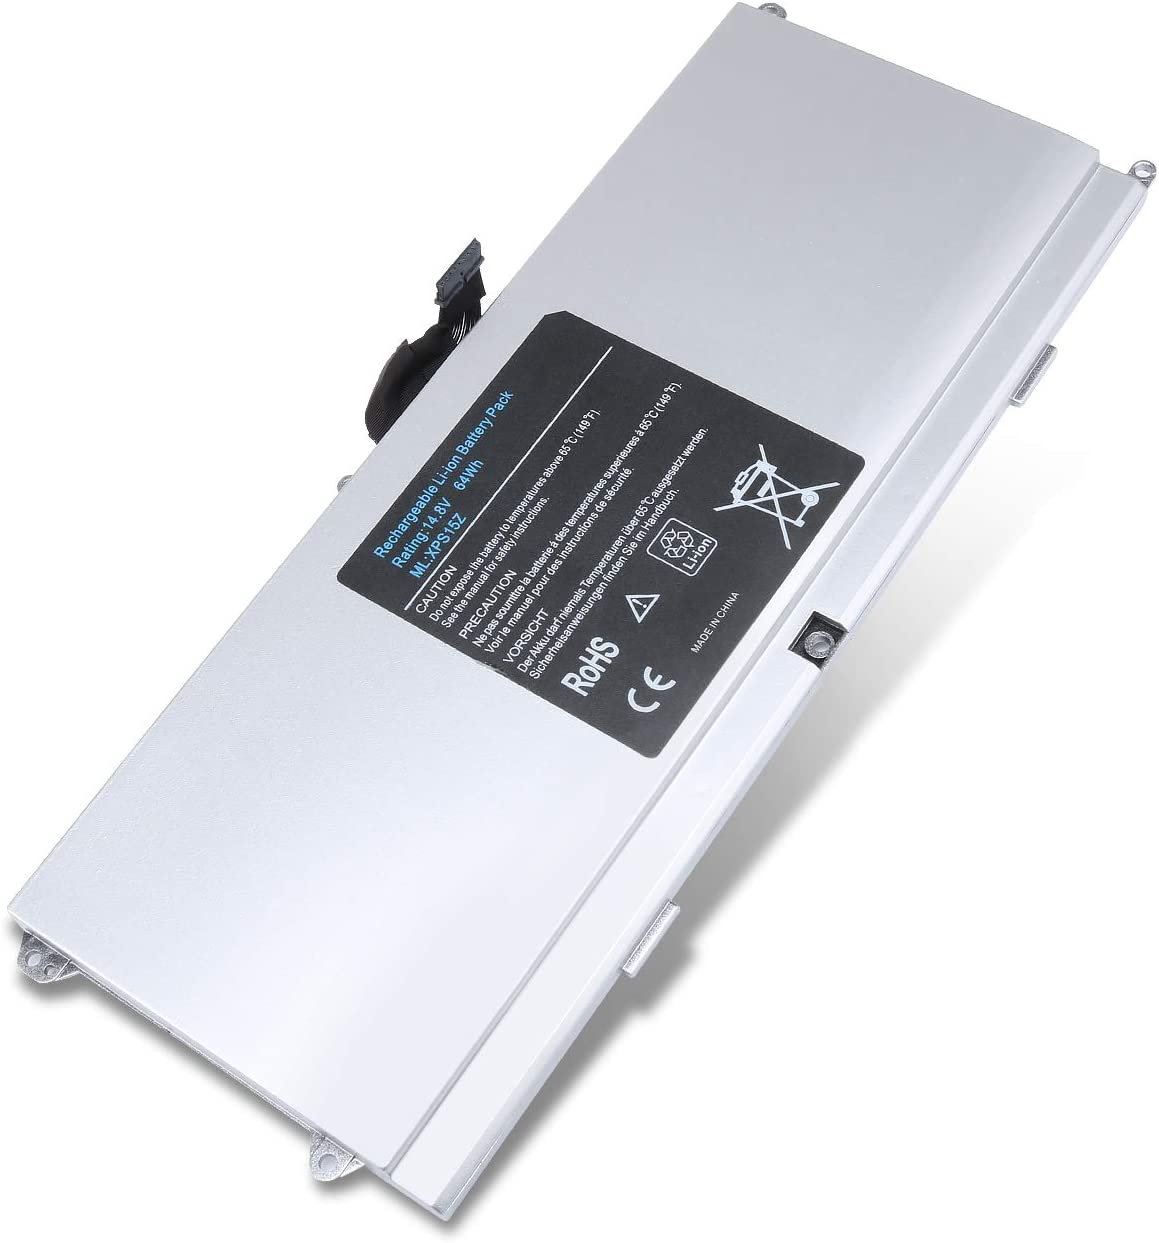 New L511X 0HTR7 Laptop Battery for Dell XPS L511Z 5834El 7502Els 0NMV5C NMV5C CN-075WY2 075WY2 Series Laptop [14.8V 64WH]